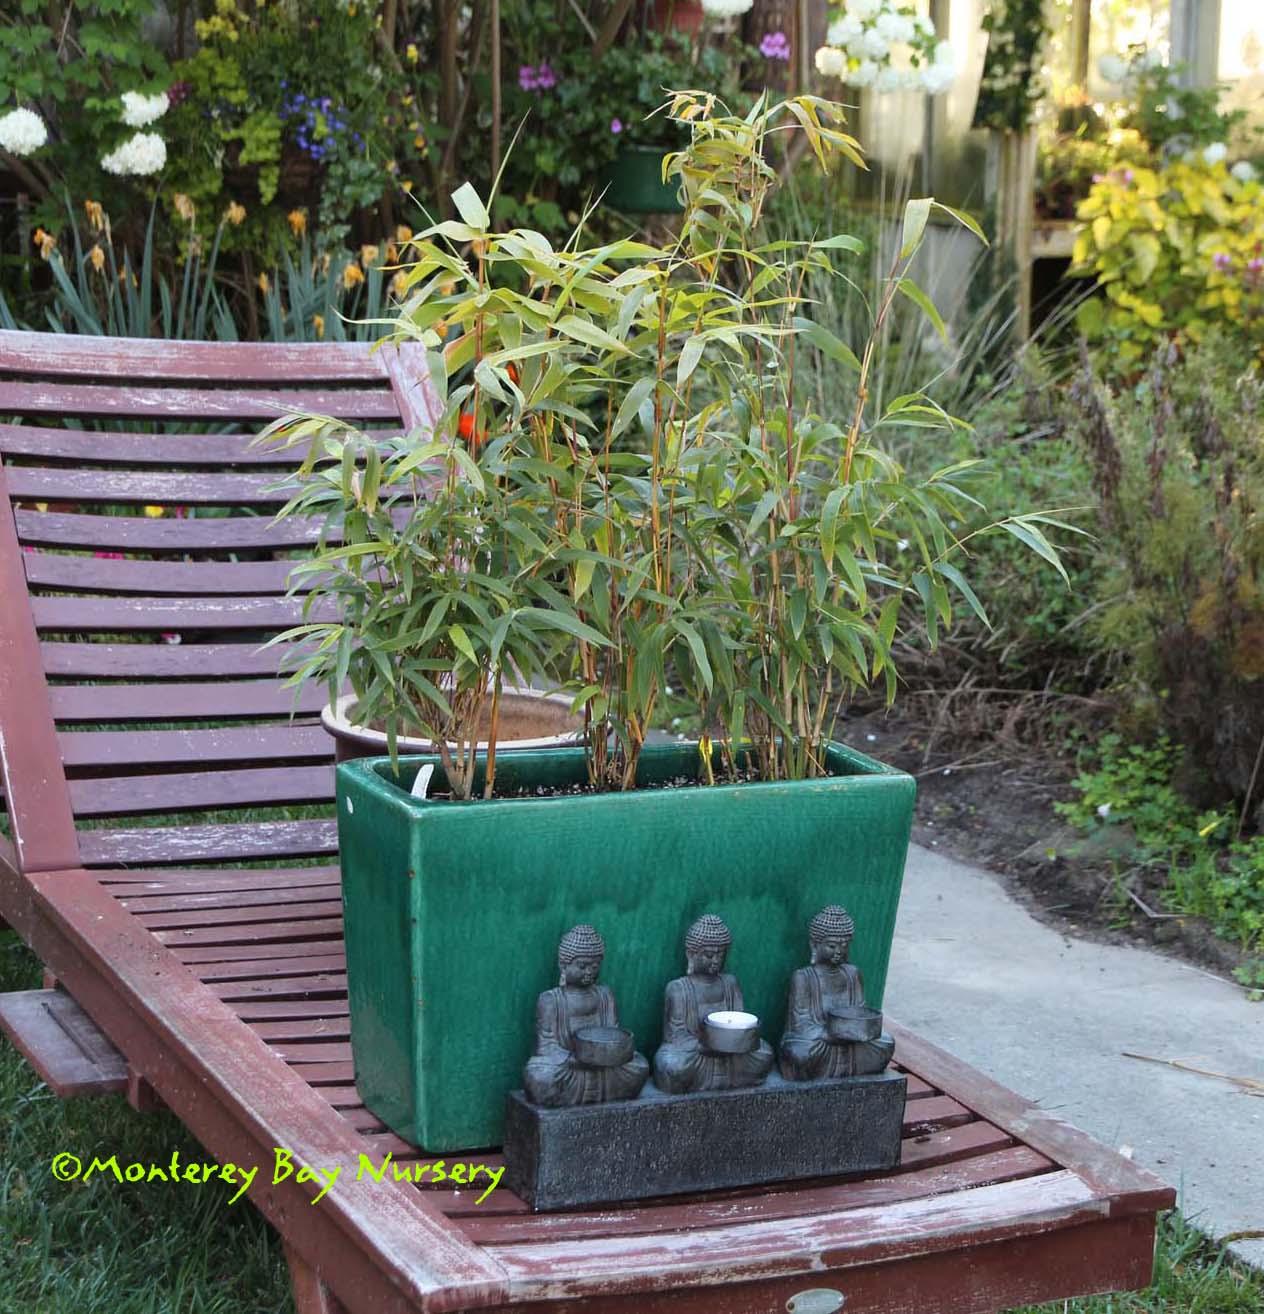 Stupendous Monterey Bay Nursery Plants B Interior Design Ideas Oteneahmetsinanyavuzinfo